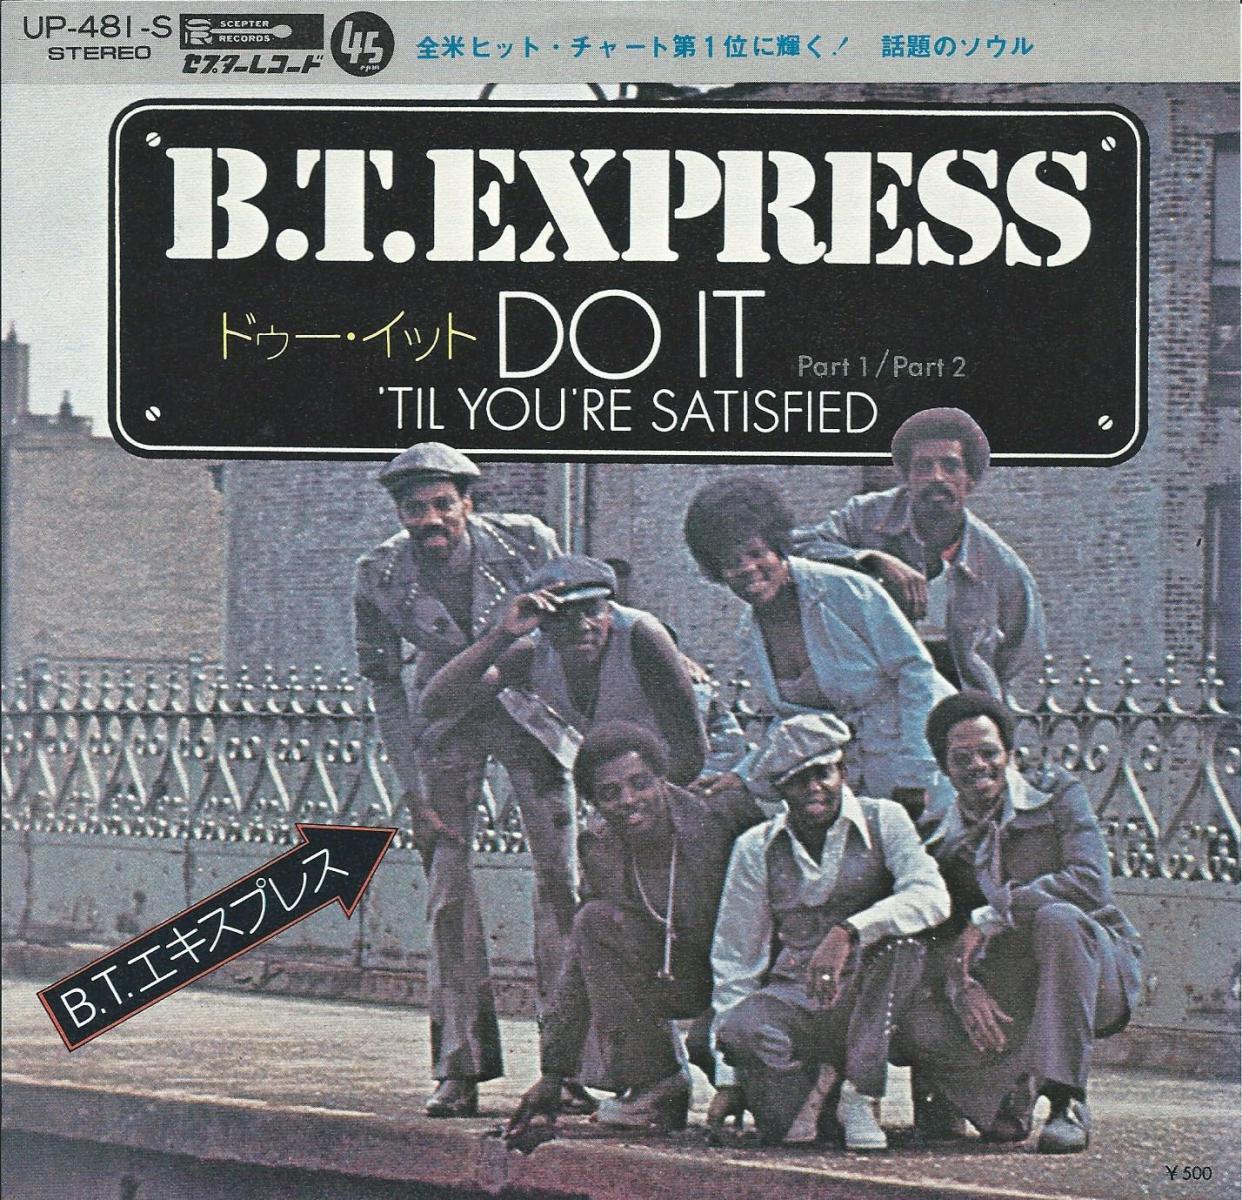 B.T.エキスプレス B.T.EXPRESS / ドゥー・イット DO IT ('TILL YOU'RE SATISFIED) (7